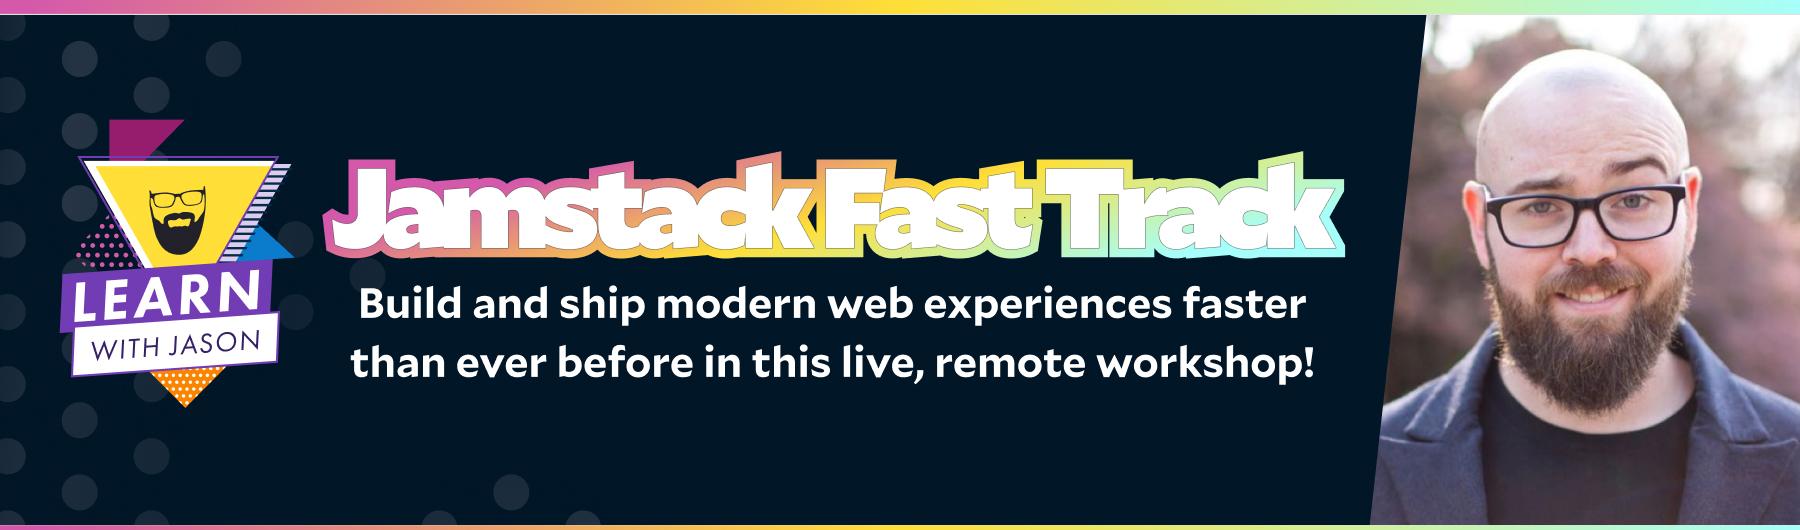 Jamstack Fast Track for Web Development Teams